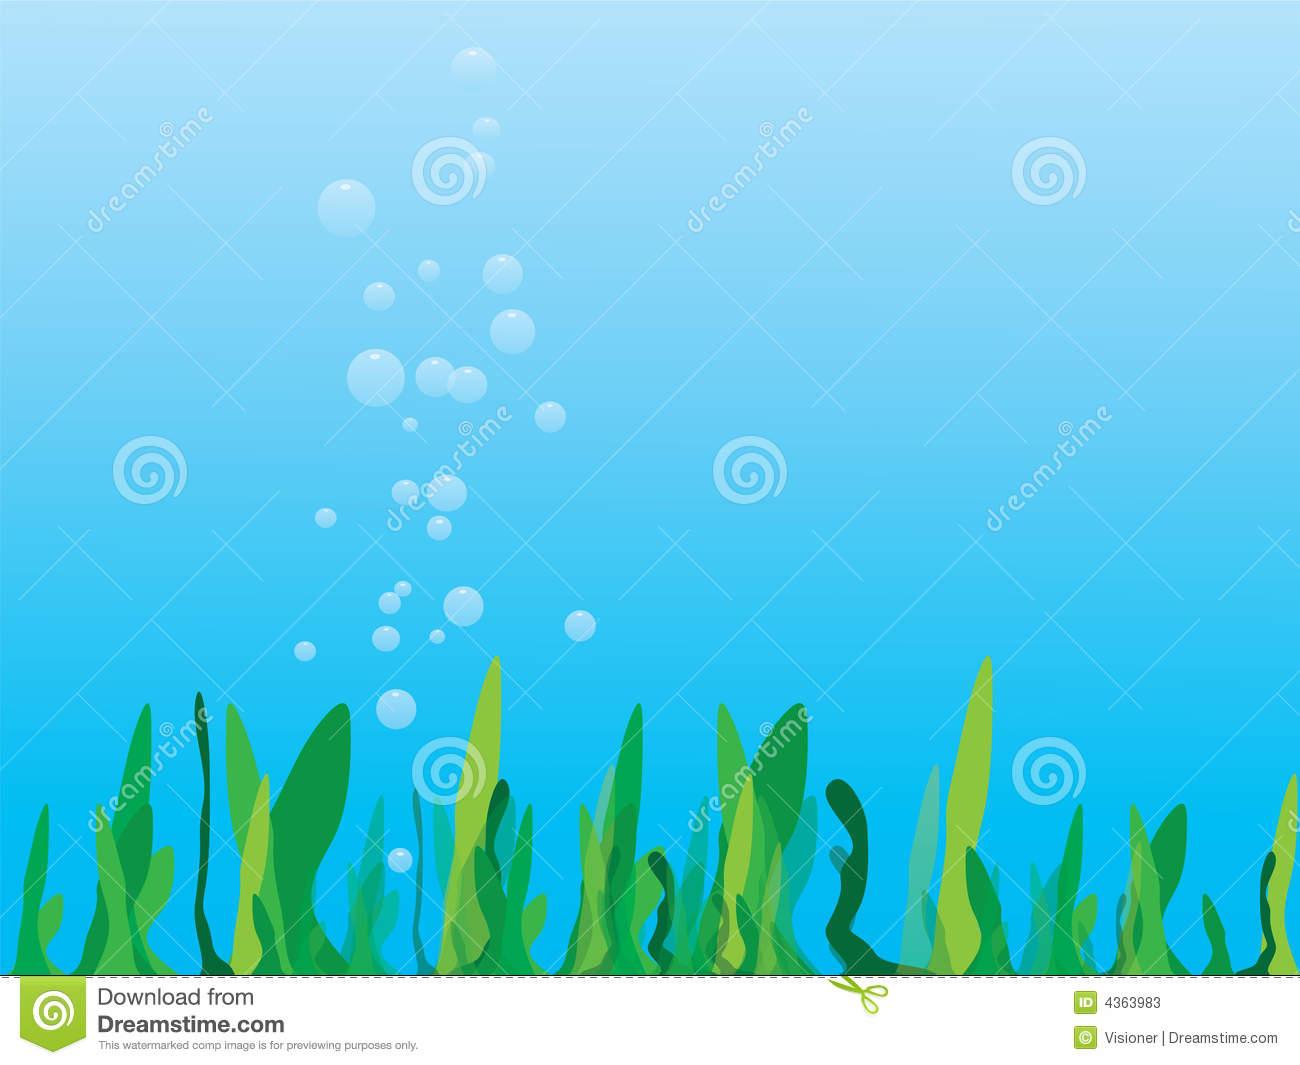 ocean cartoon clip art - photo #42